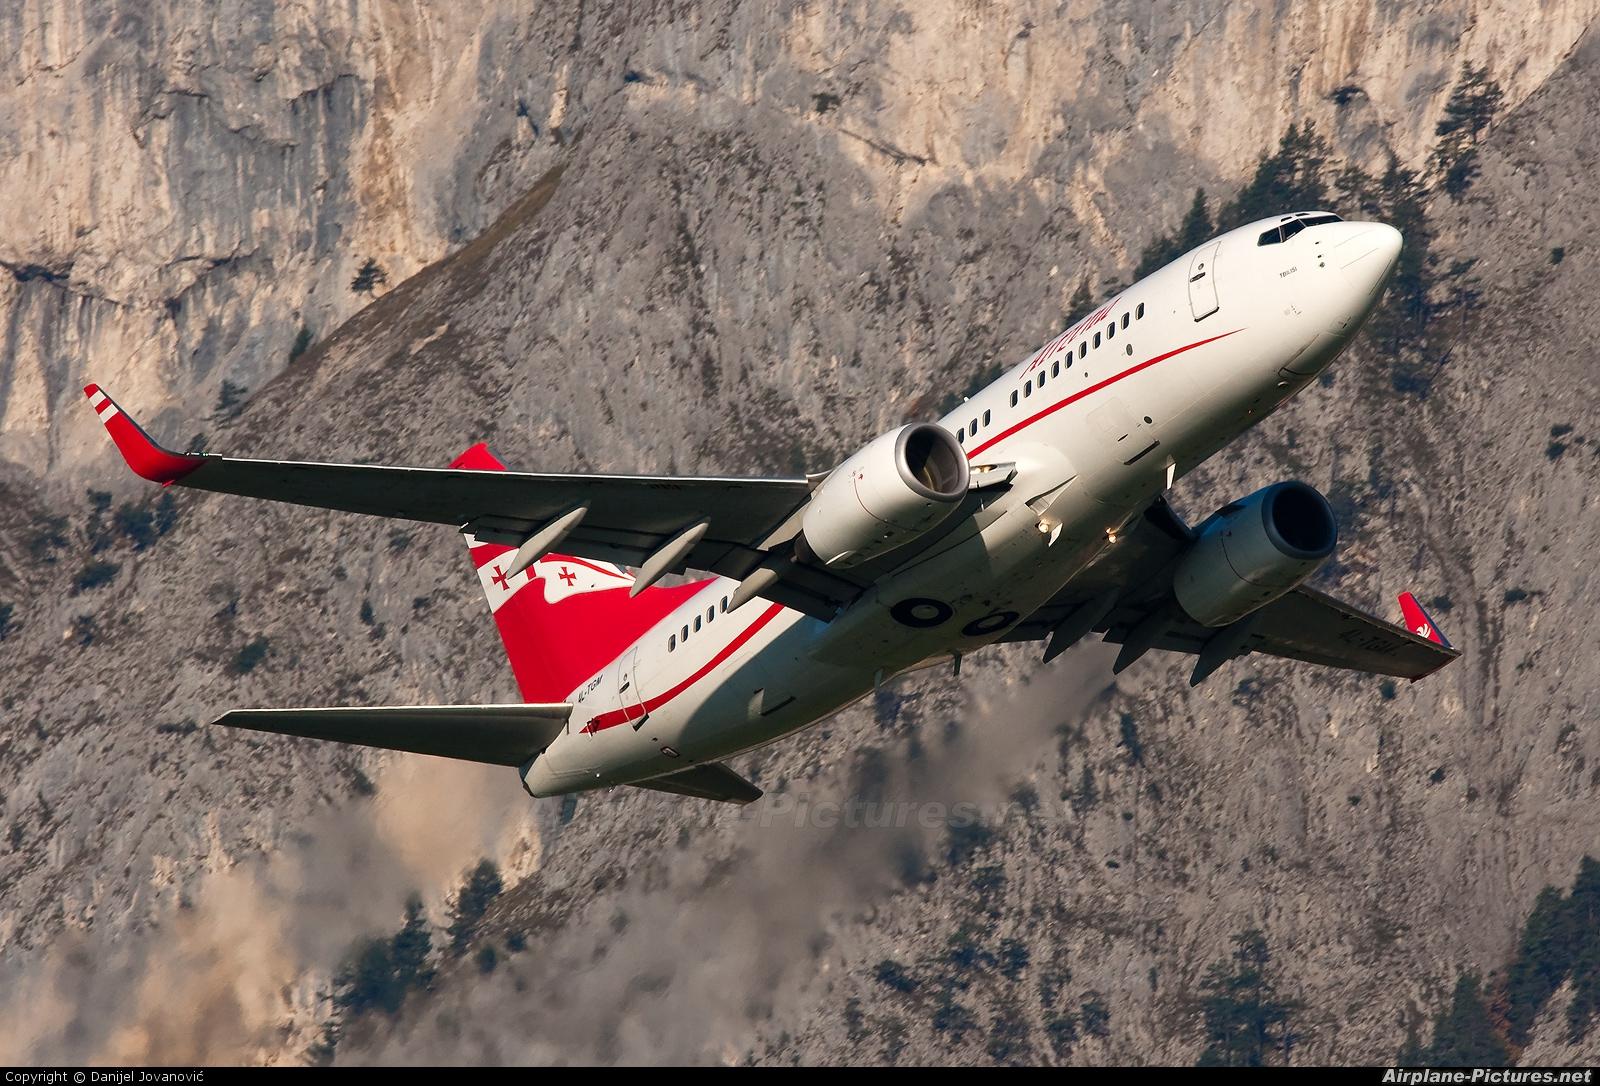 Airzena - Georgian Airlines 4L-TGM aircraft at Innsbruck